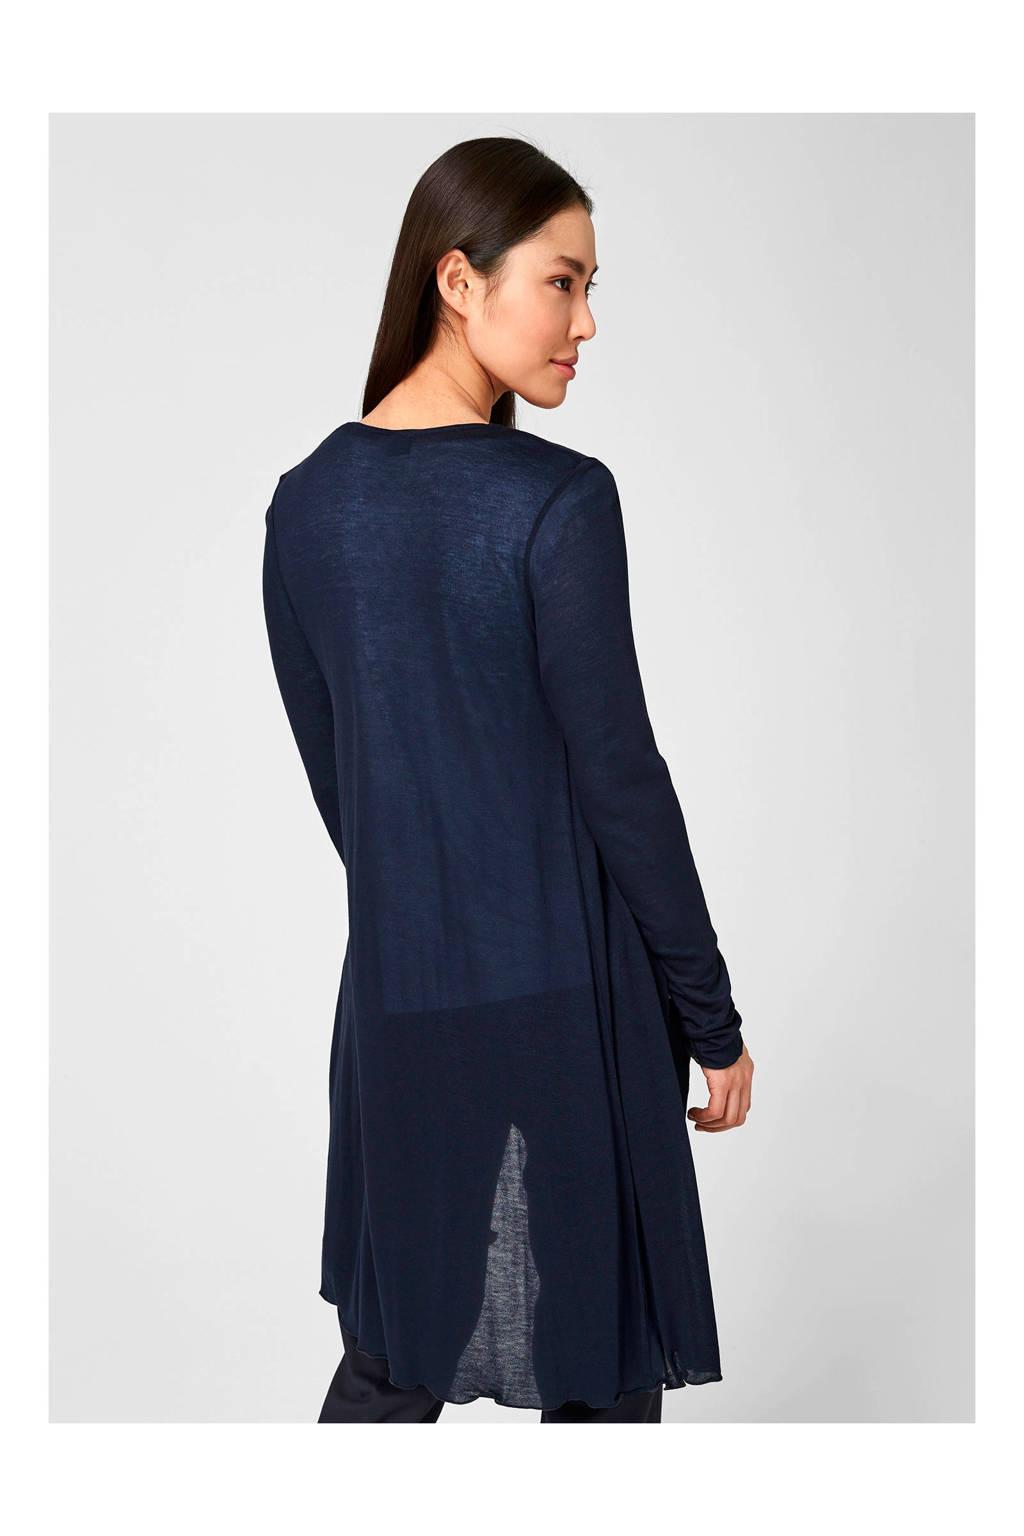 s.Oliver BLACK LABEL vest blauw, Blauw